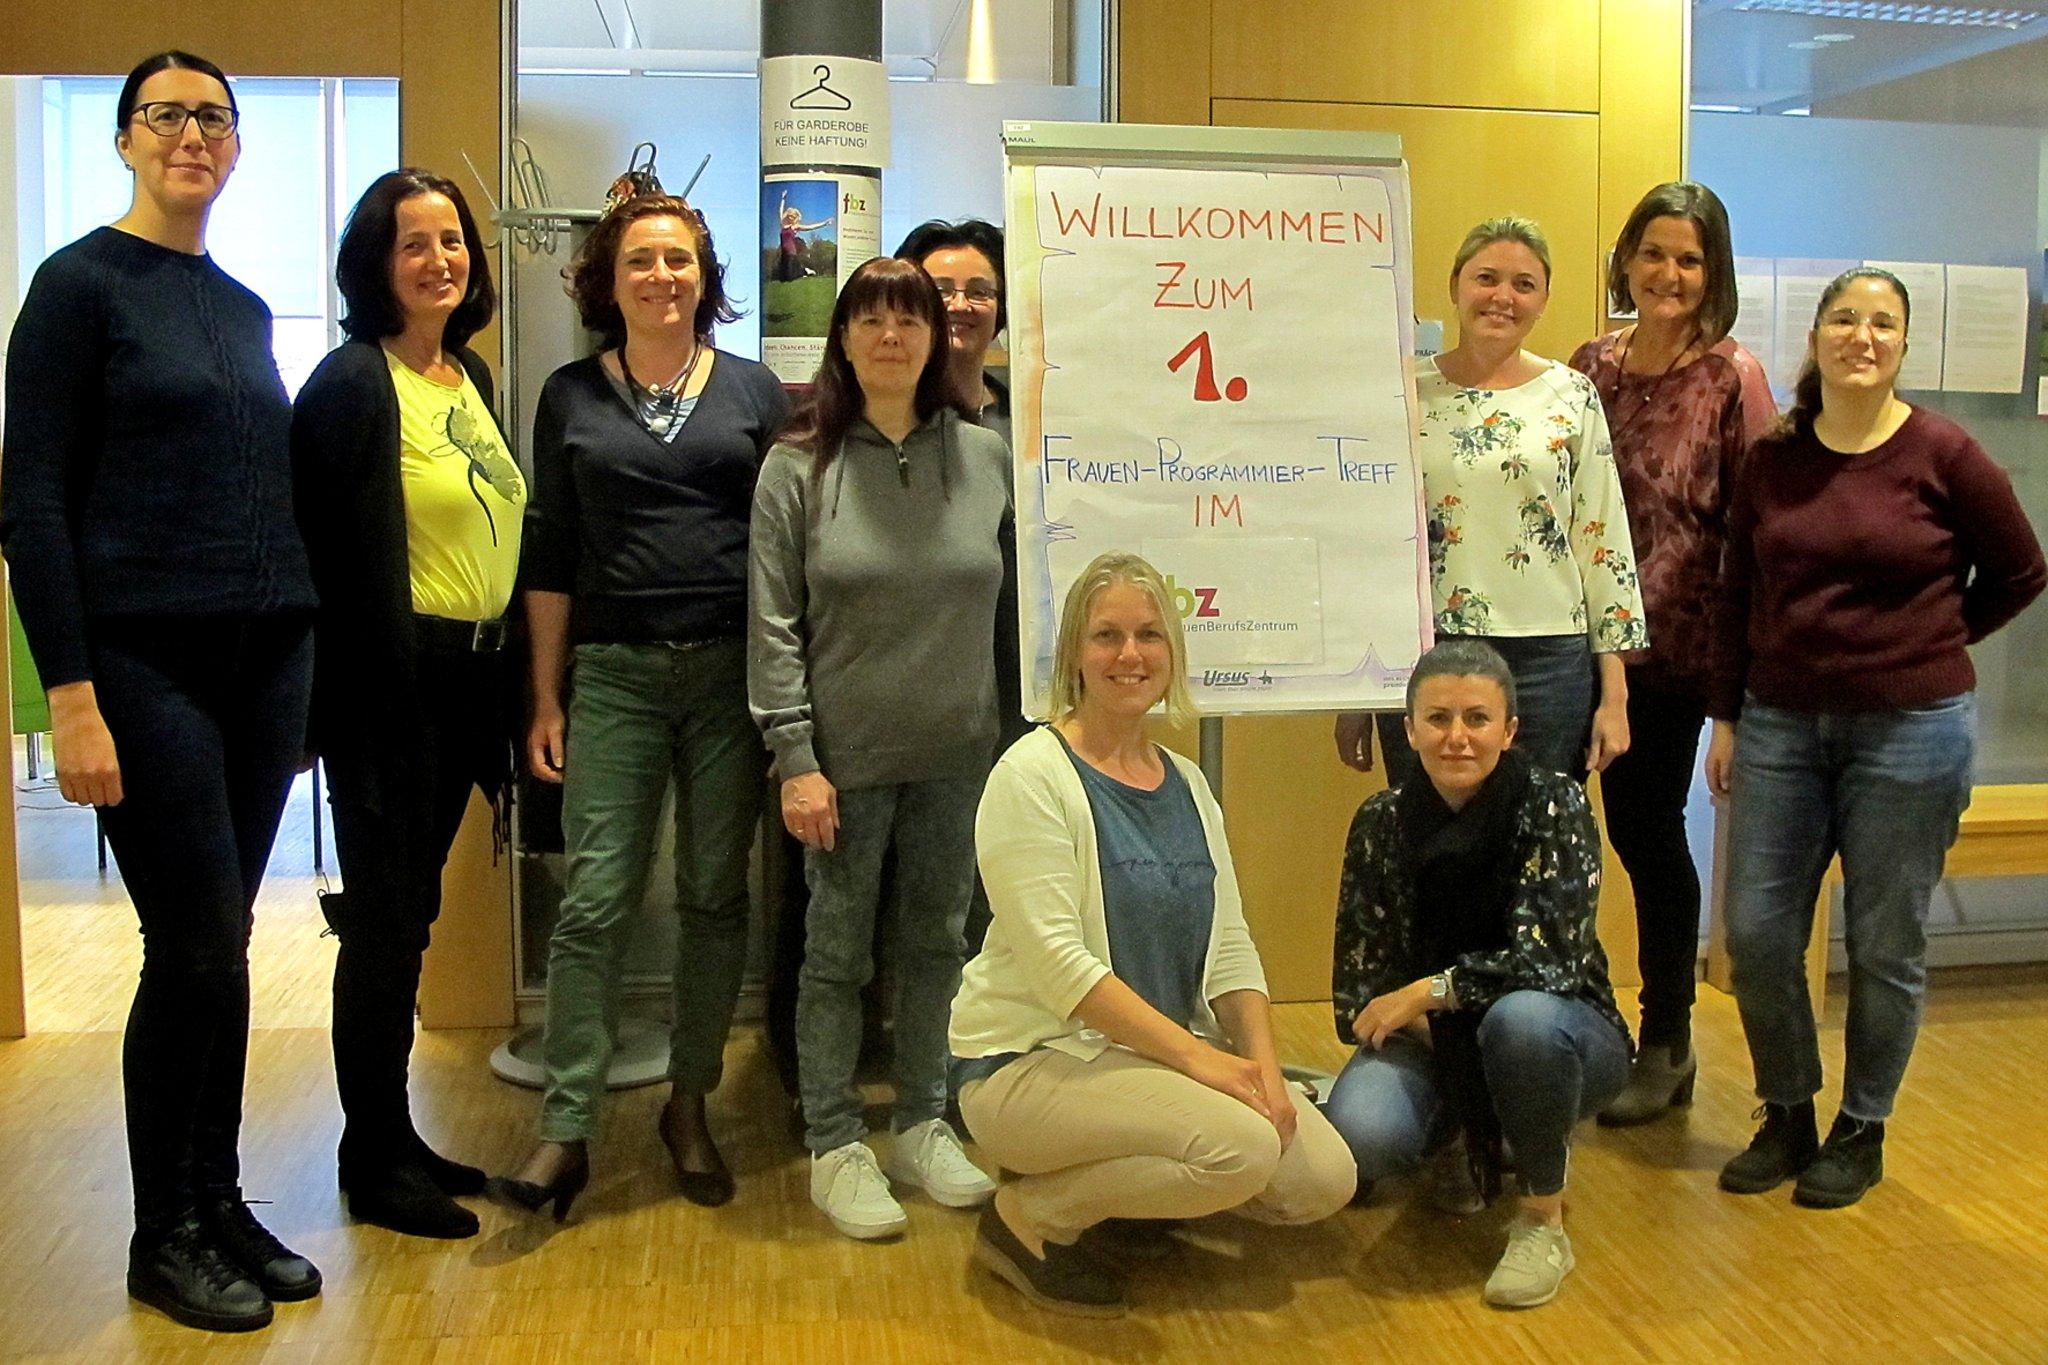 Frhstcks-Treffen fr Frauen in der Region Wels - zarell.com